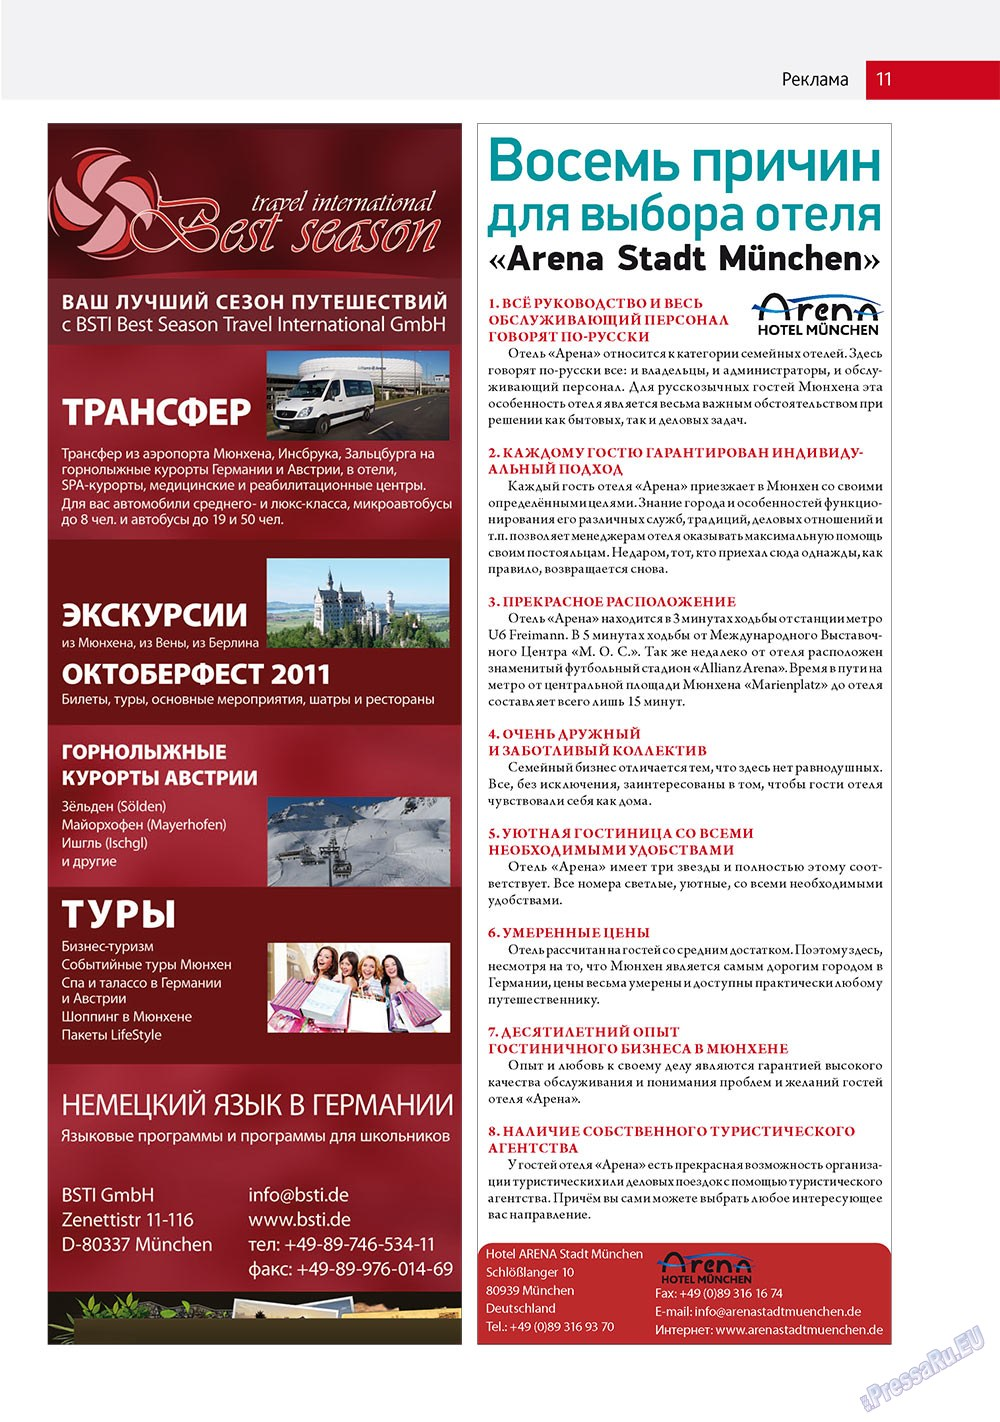 Бизнес парк (журнал). 2011 год, номер 5, стр. 11